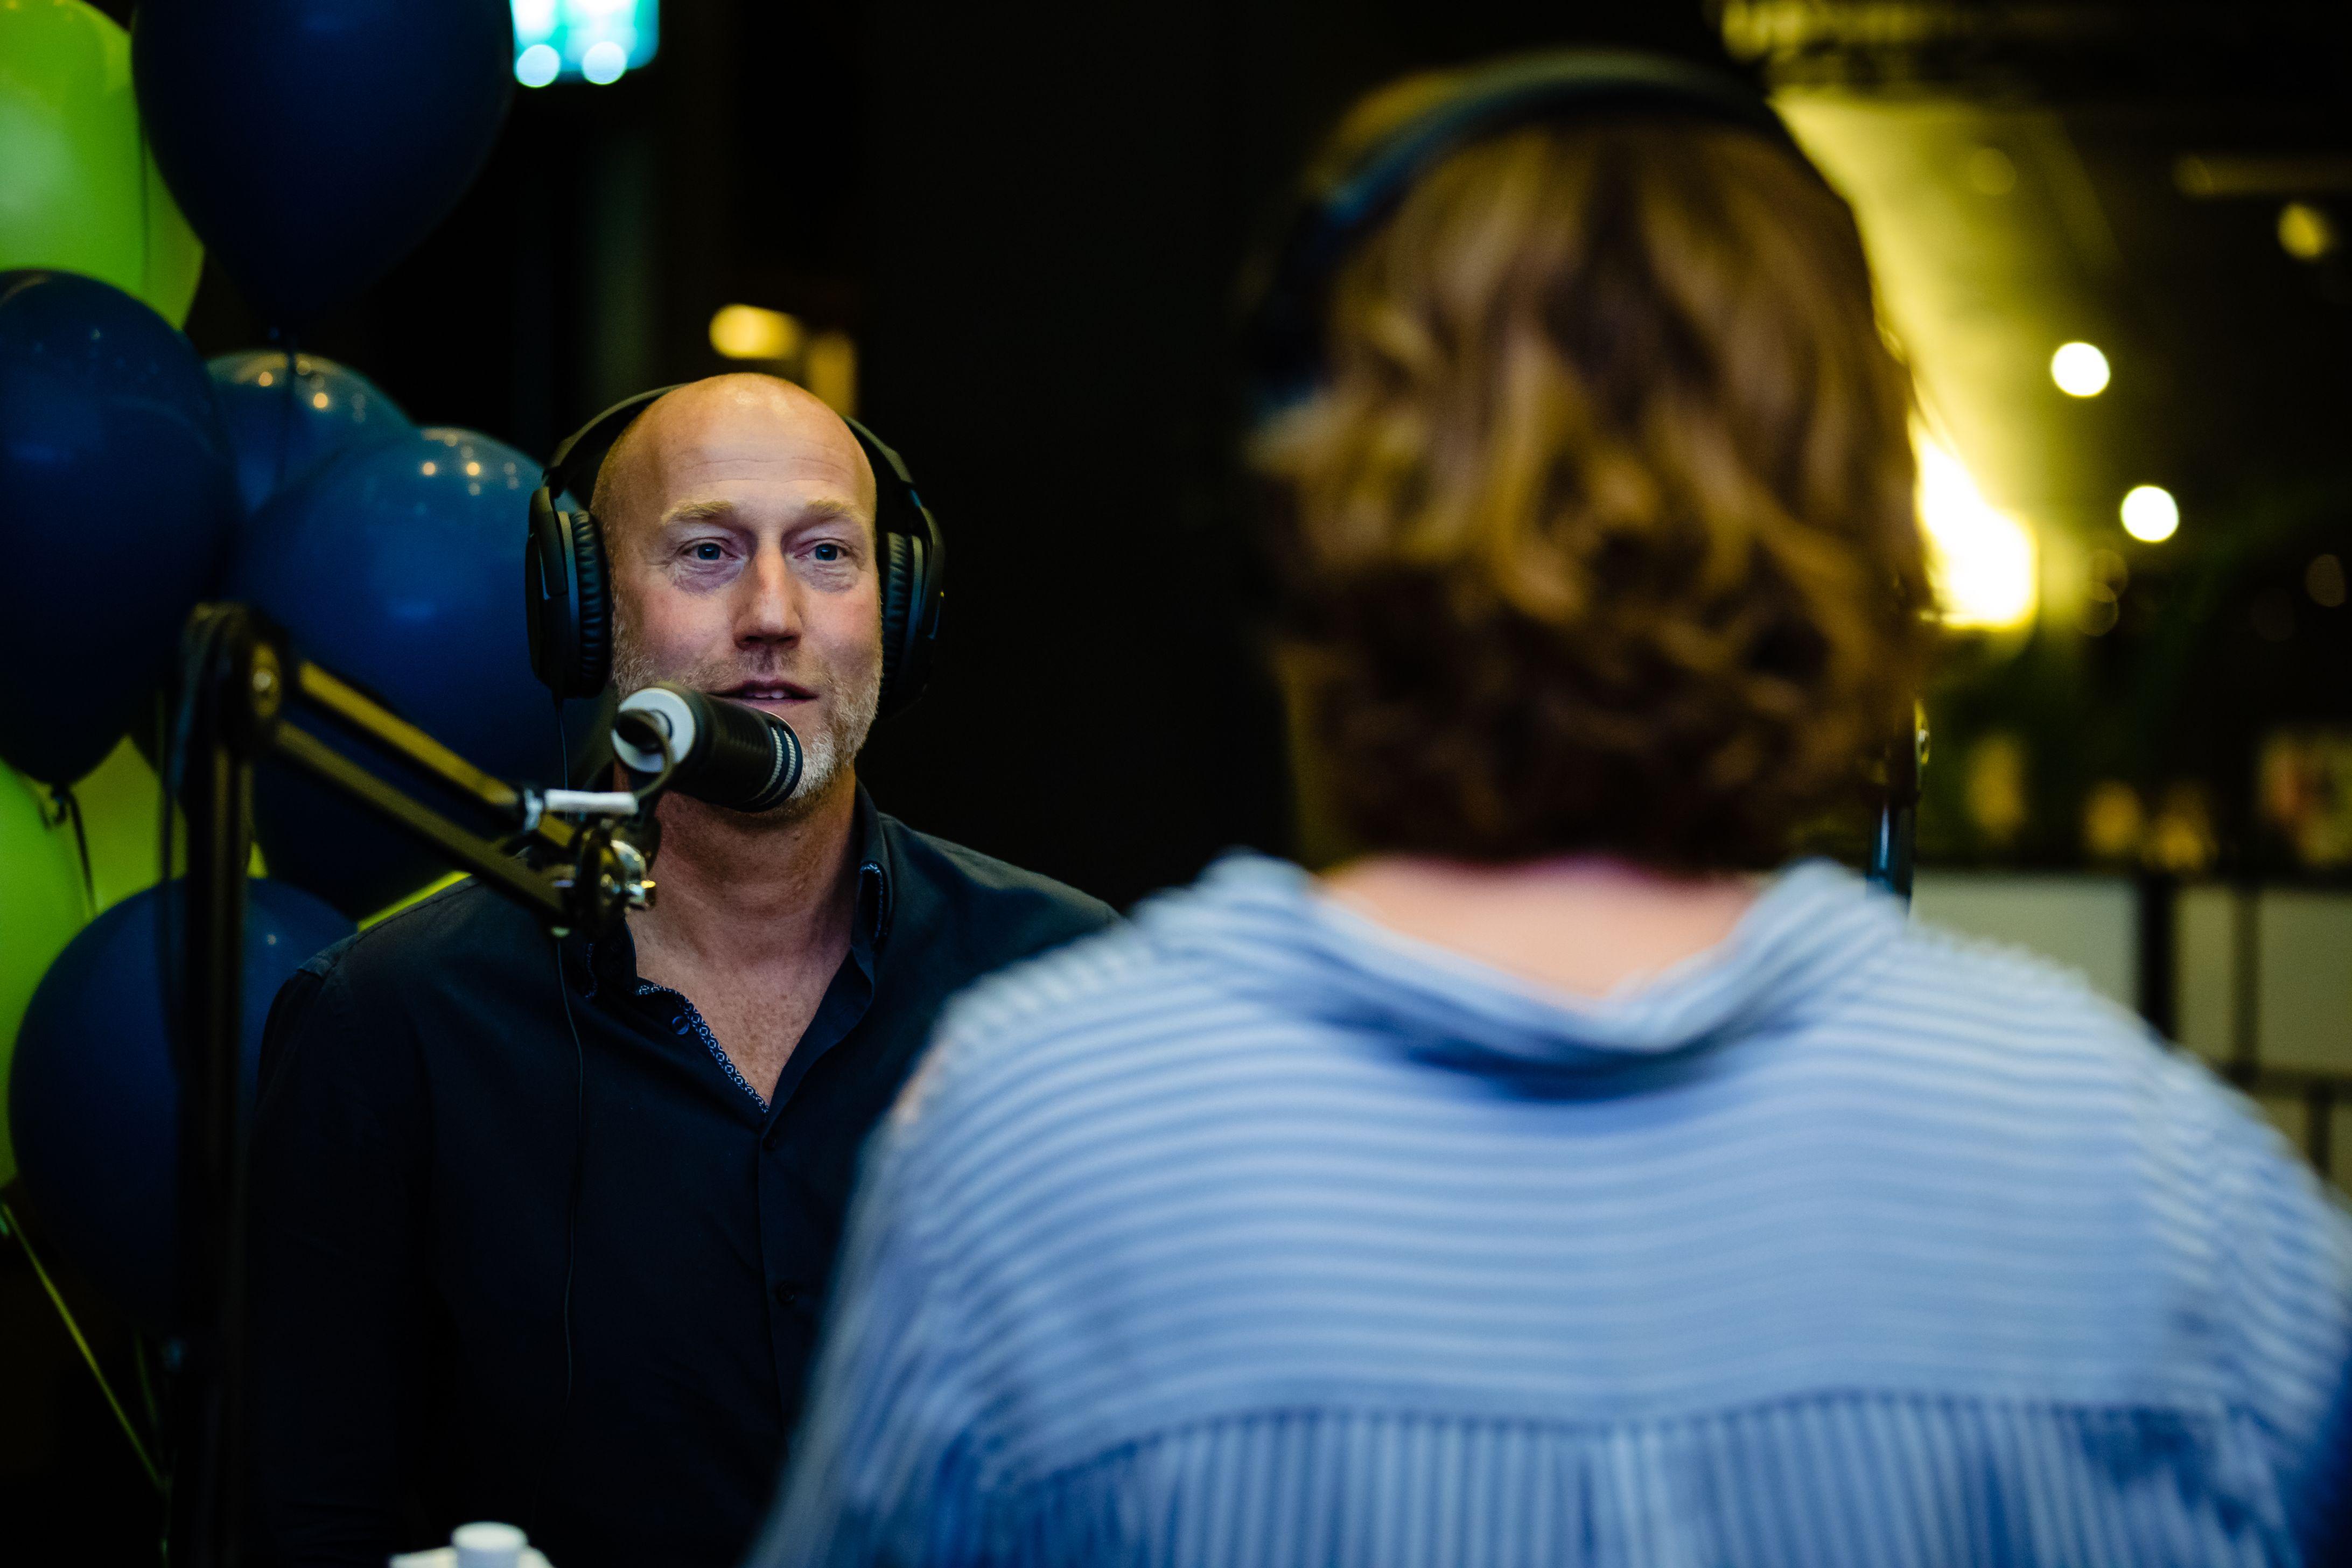 LVSC jubileumcongres 2021 - podcast Arjan Erkel